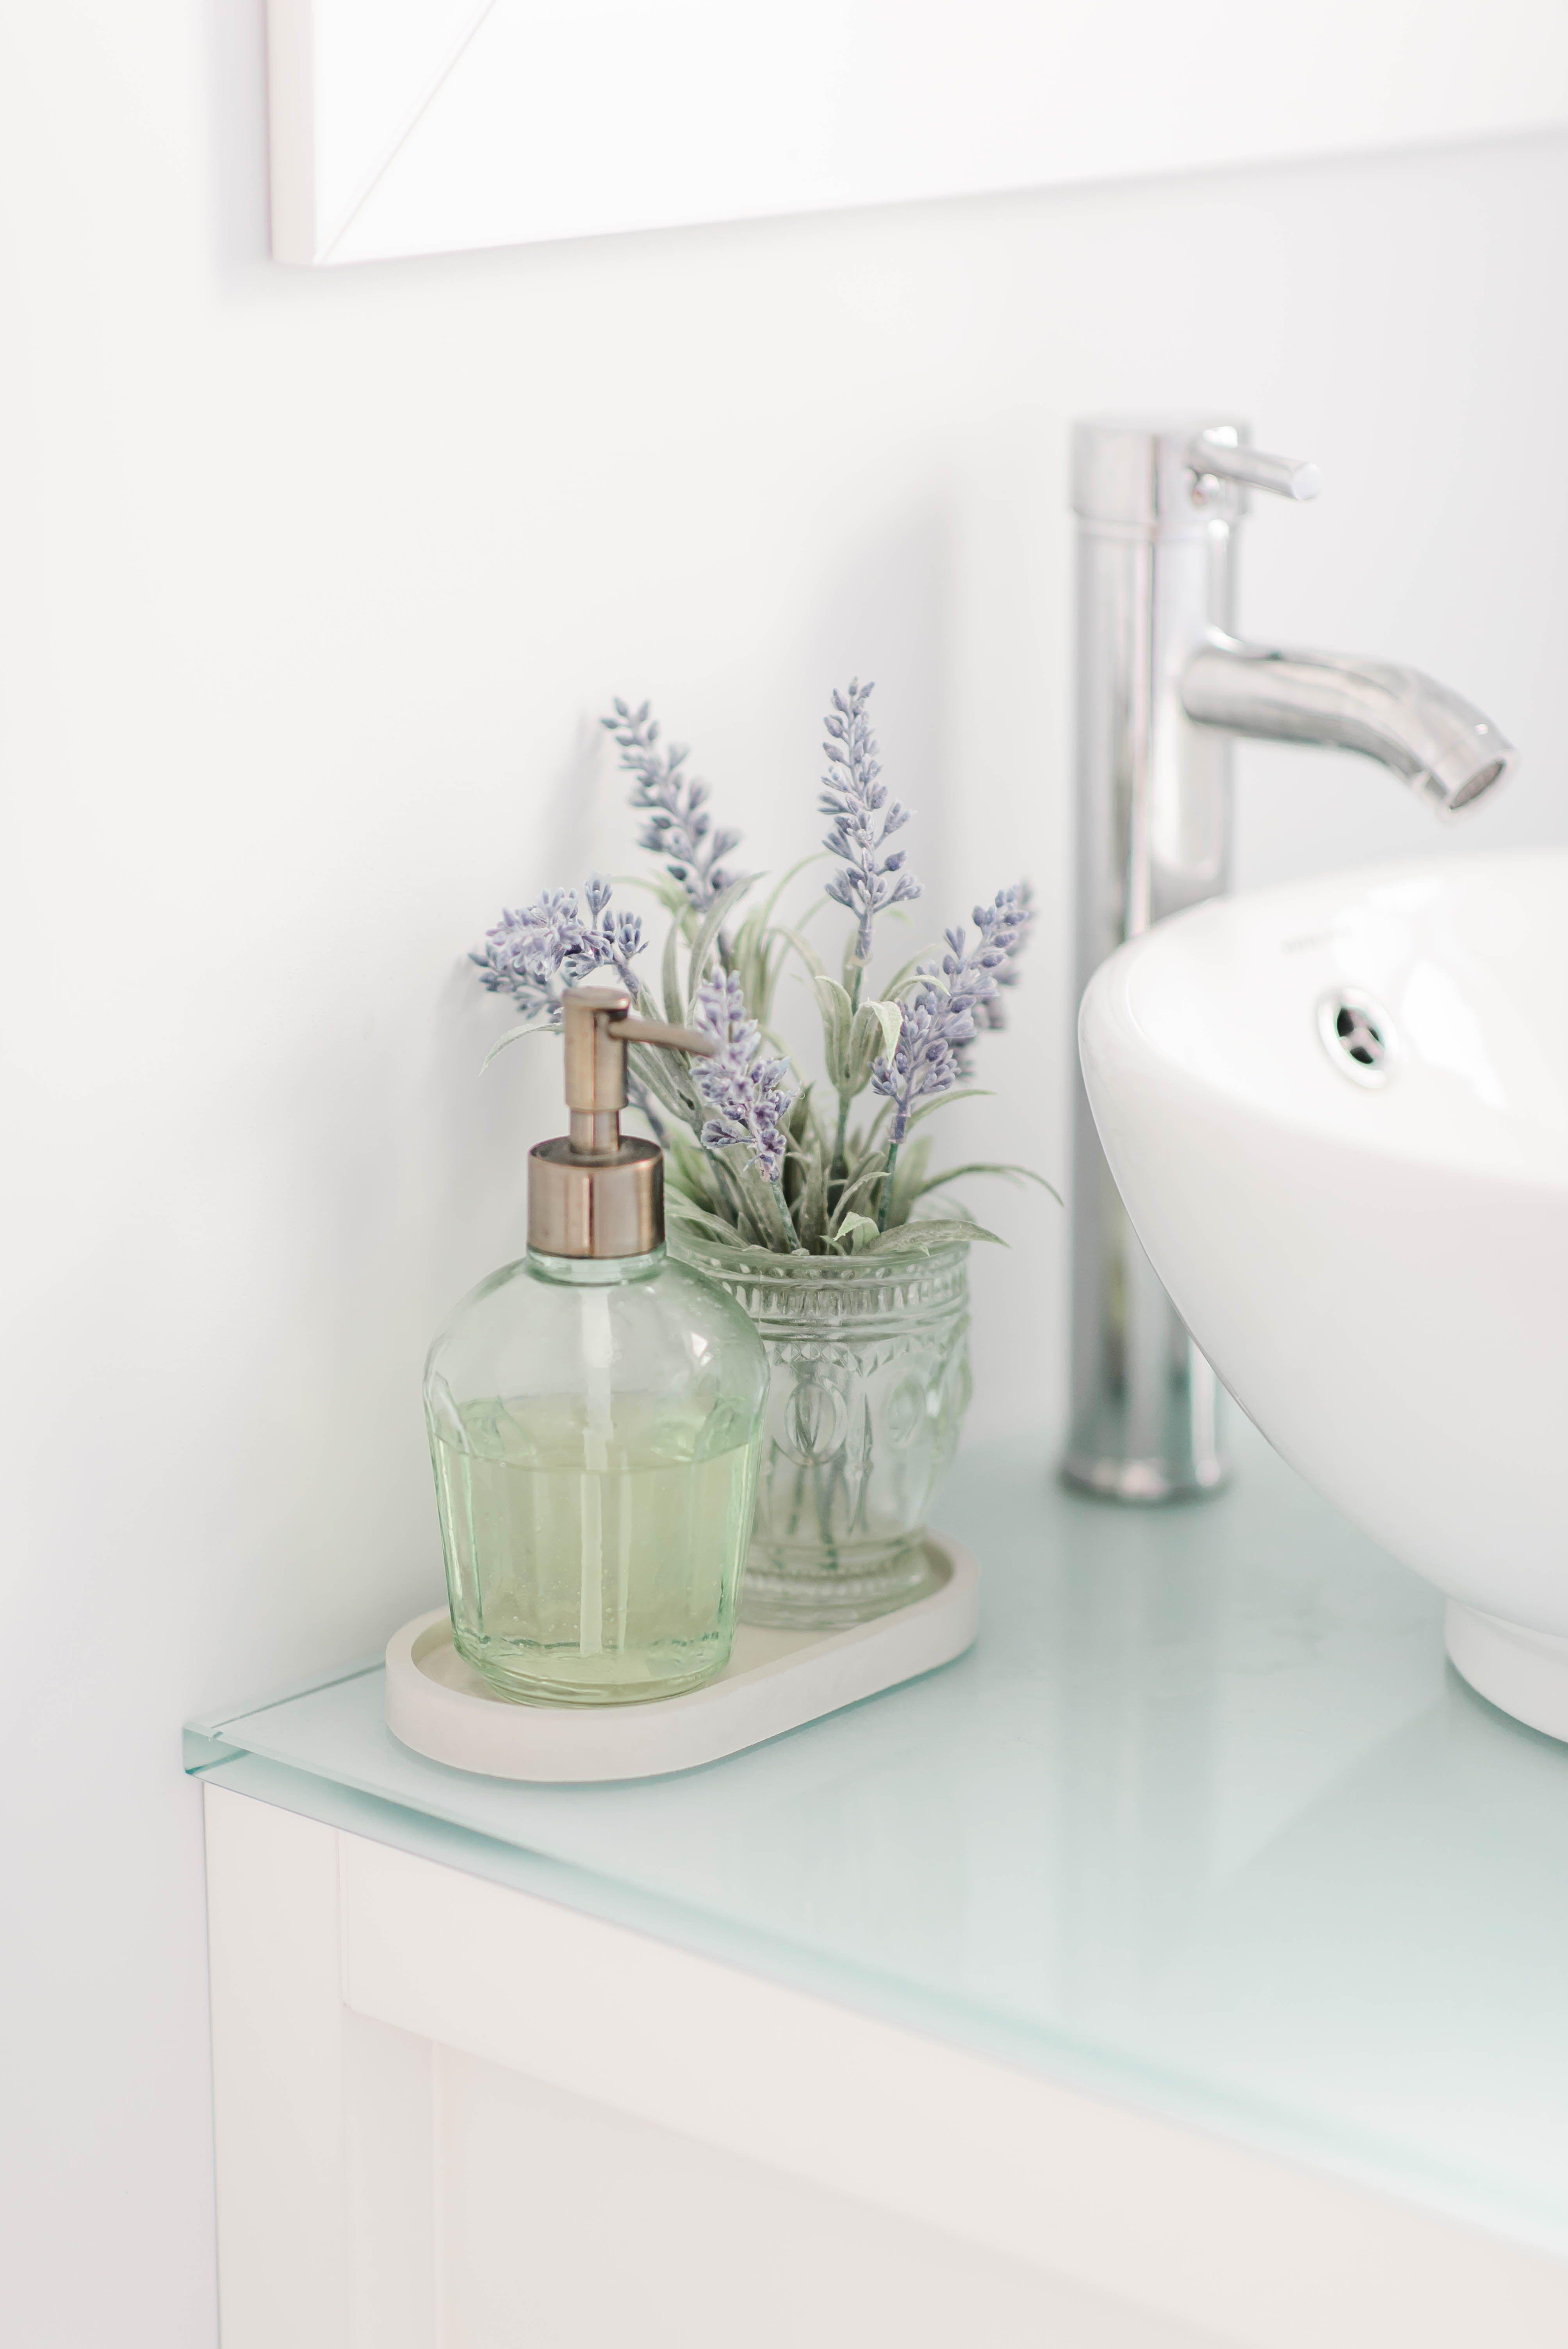 Kitchen Soap Dispenser Tray Soap Bottle Tray Kitchen Sink Caddy Dish Soap Organizer Soap Dispenser Soap Dispenser Tray Bathroom Tray [ 6016 x 4016 Pixel ]